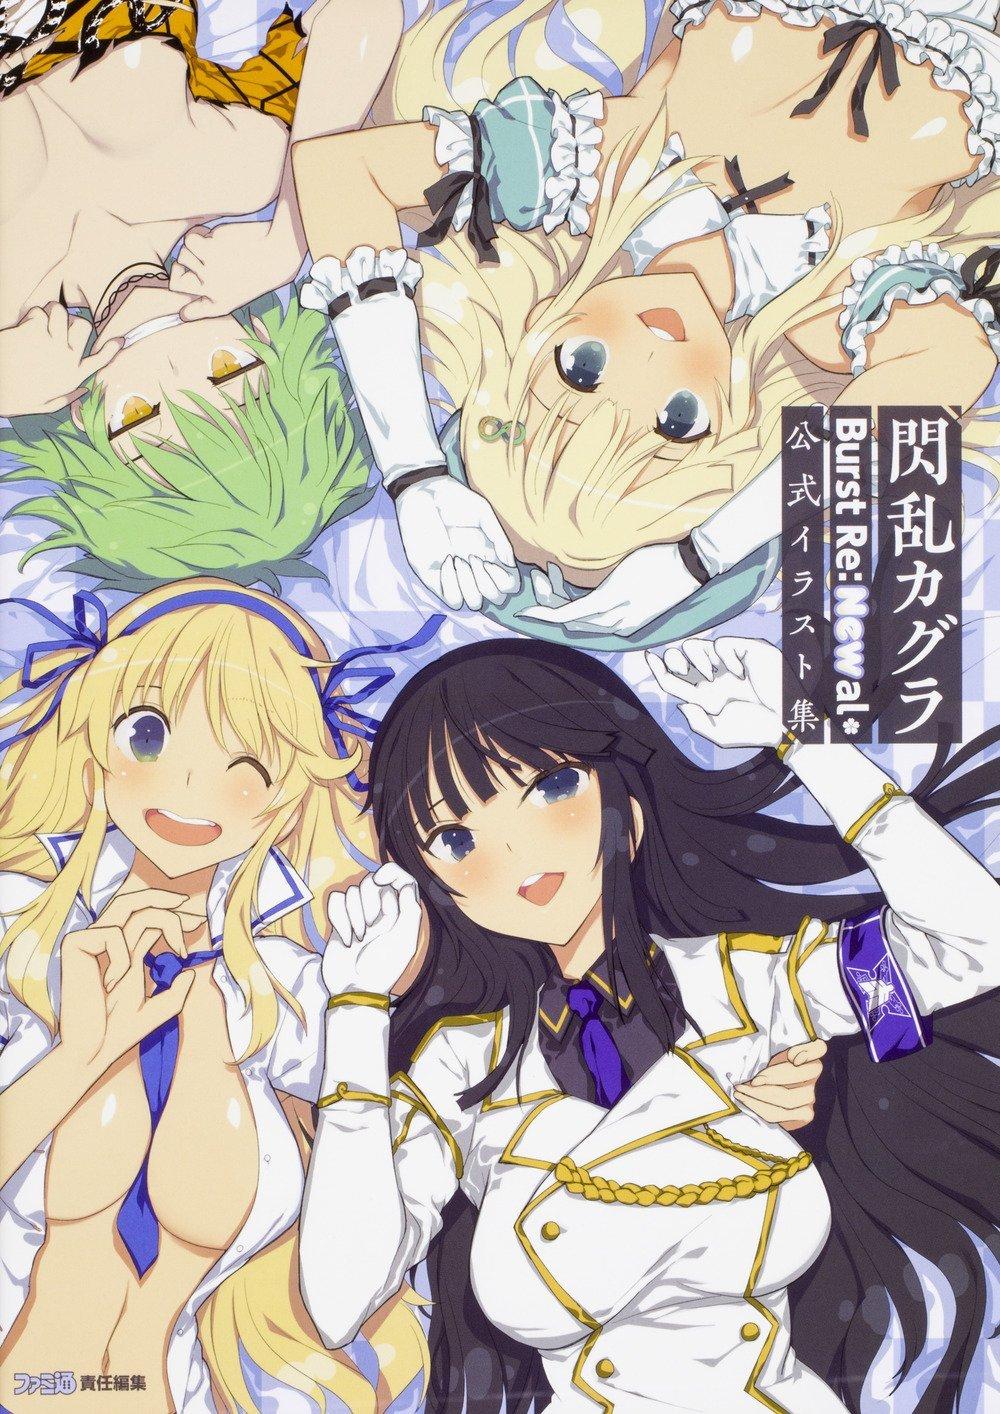 Senran Kagura Burst Re:Newal Official Illustration Collection